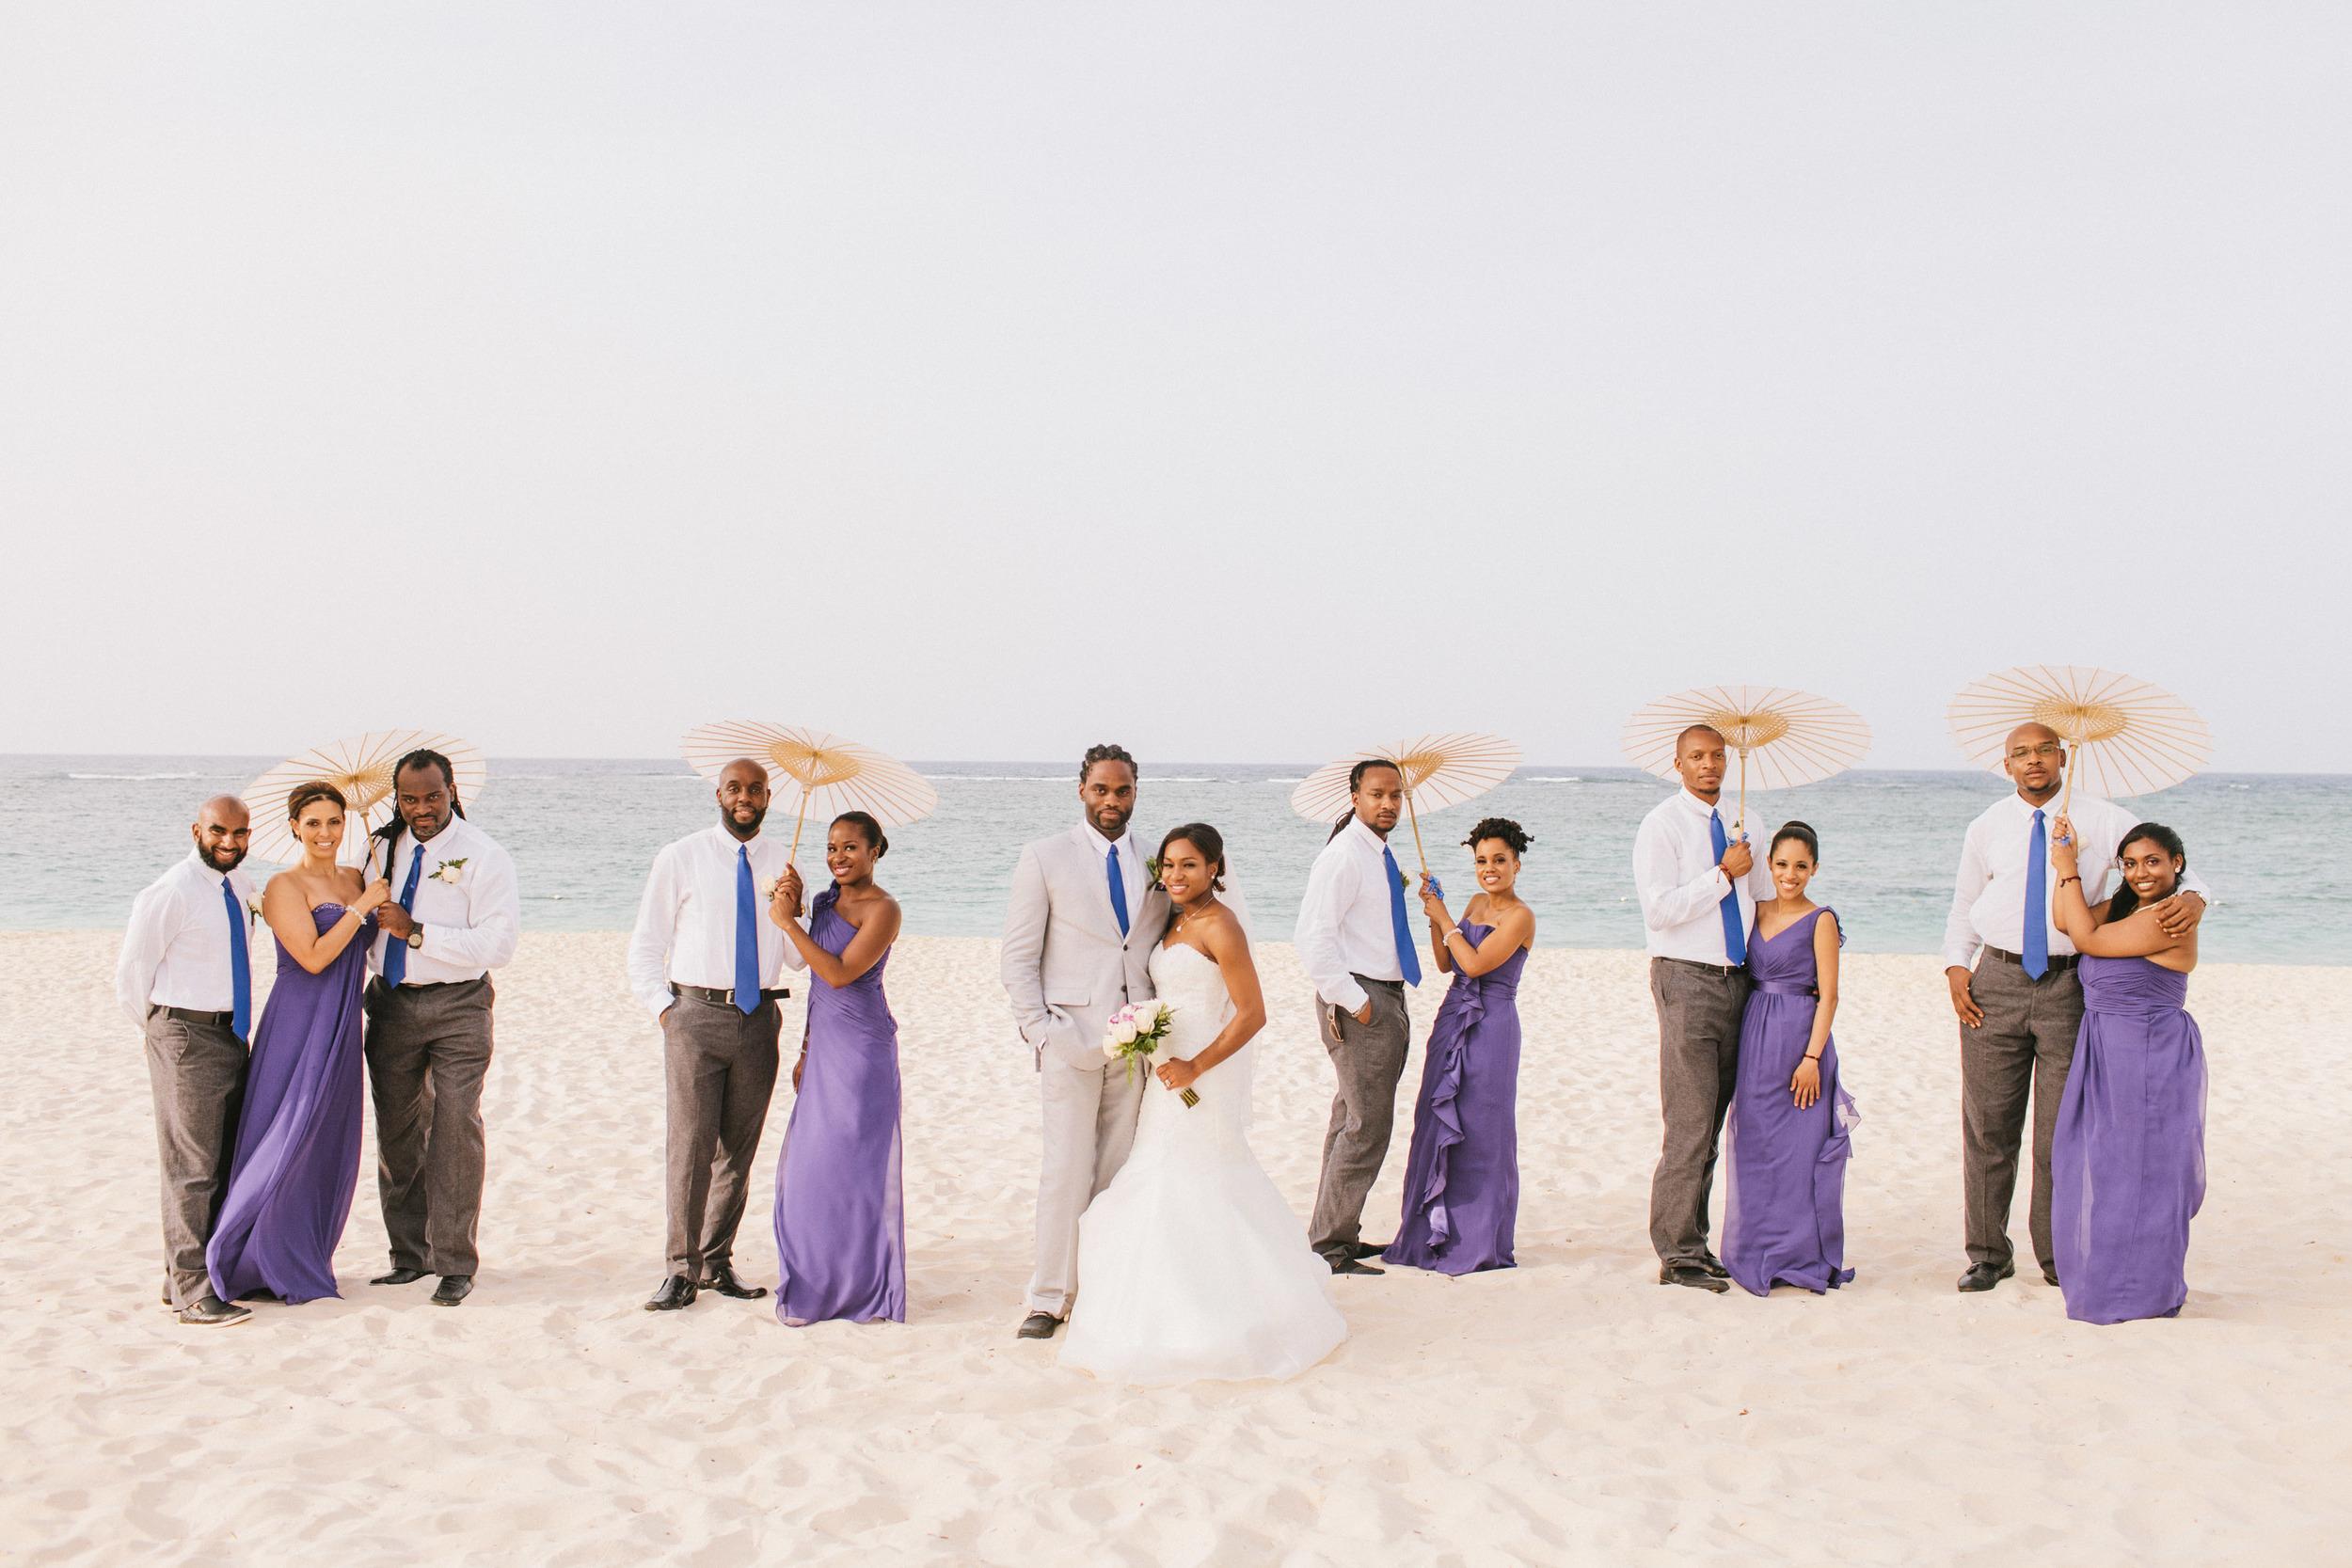 michael-rousseau-photography-dominican-republic-destination-wedding-cara-jason-colonial-majestic-dominican-republic105.jpg